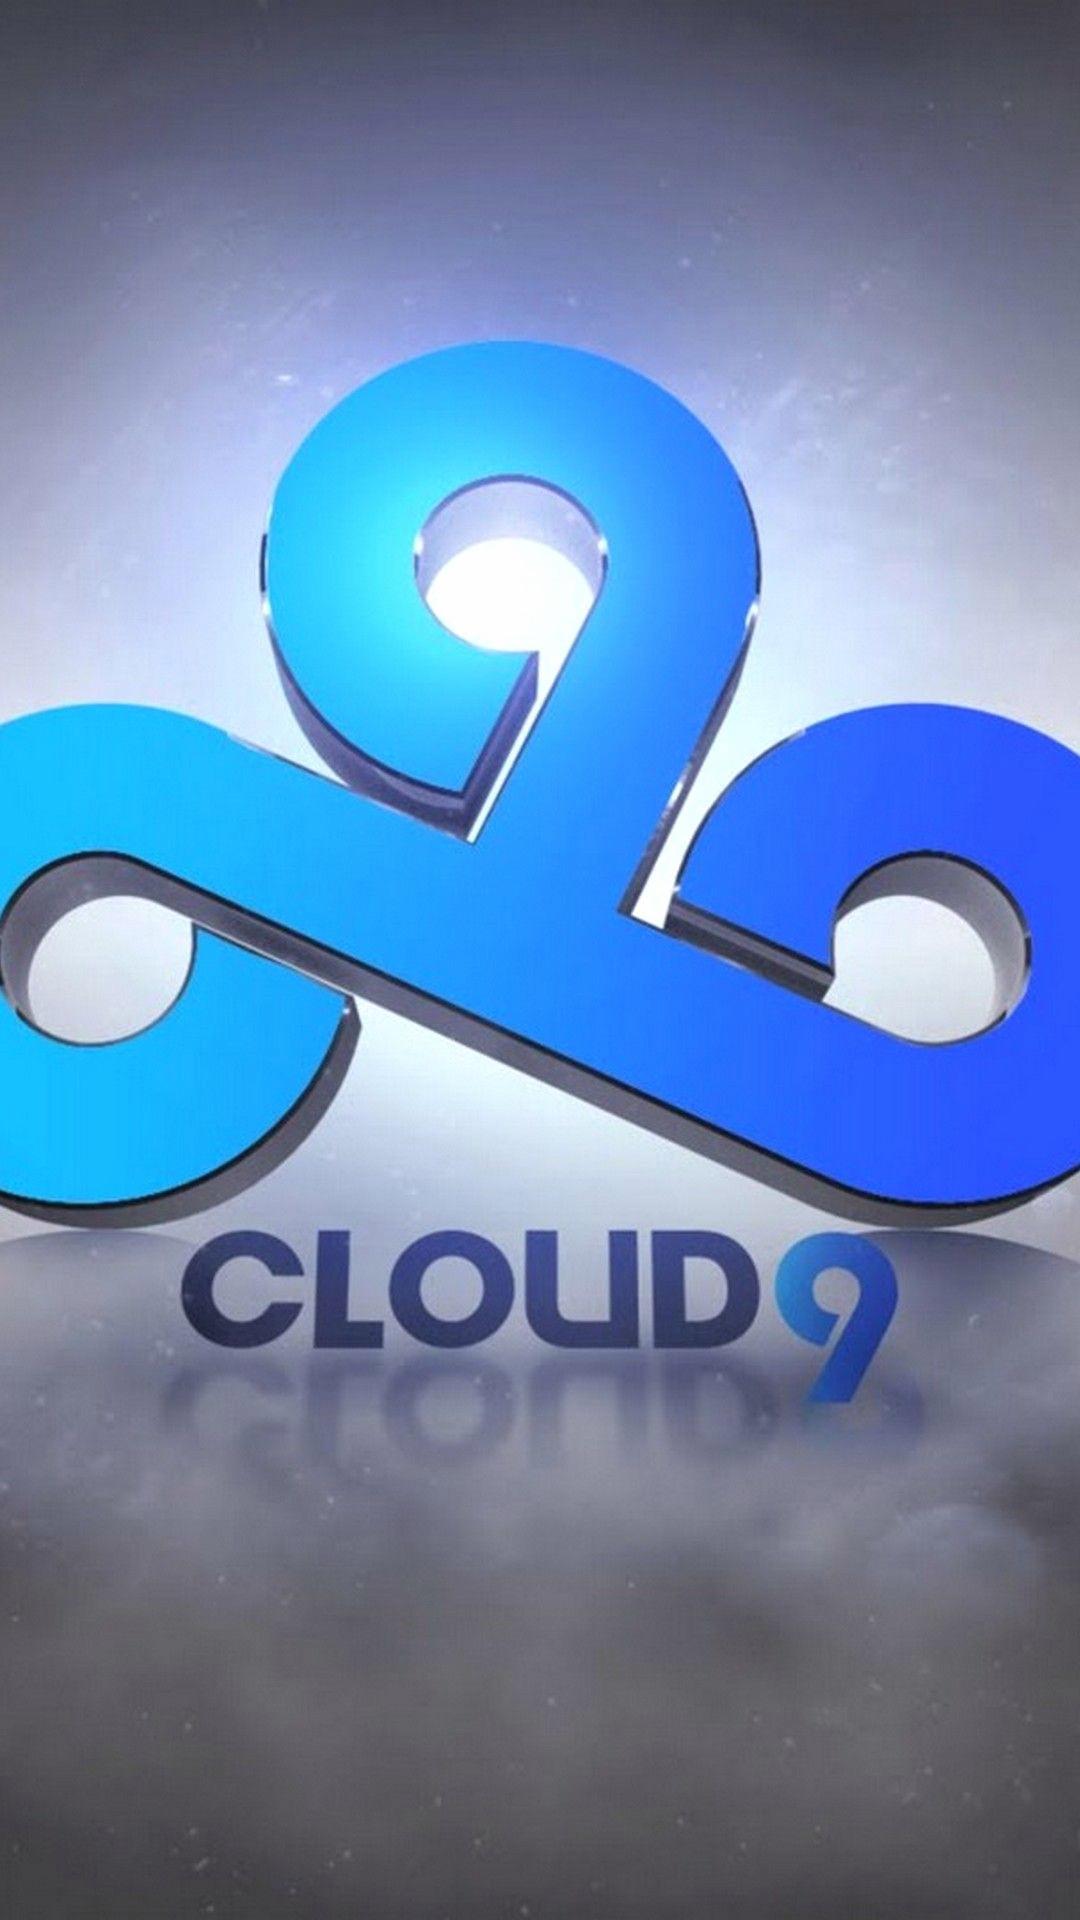 Res: 1080x1920, iPhone 5 Wallpaper Kentucky iPhone 7 Wallpaper Cloud 9 Games Best iPhone  Wallpaper Of iPhone 5